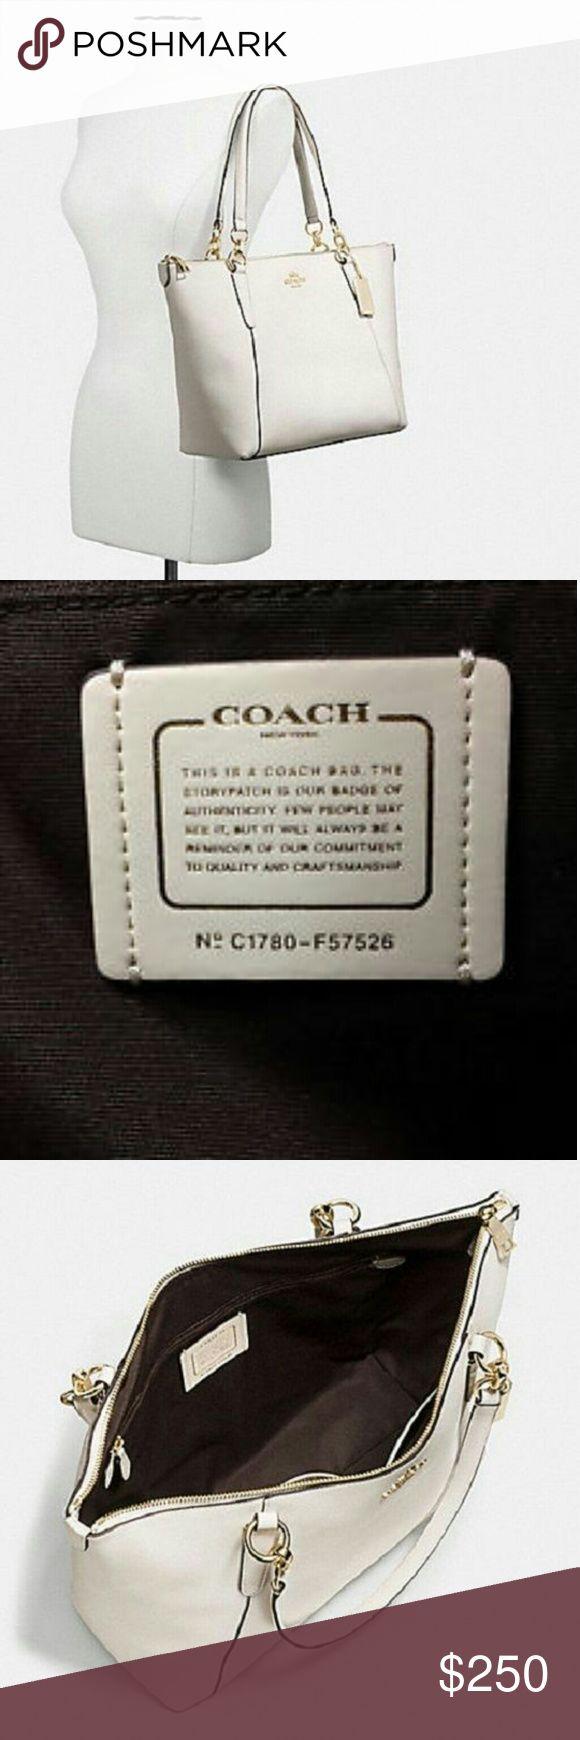 Coach New York Cross-Grain Leather Handbag New Coach F57526 AVA Crossgrain Leather Tote Handbag Purse Shoulder Bag in White Coach Bags Totes